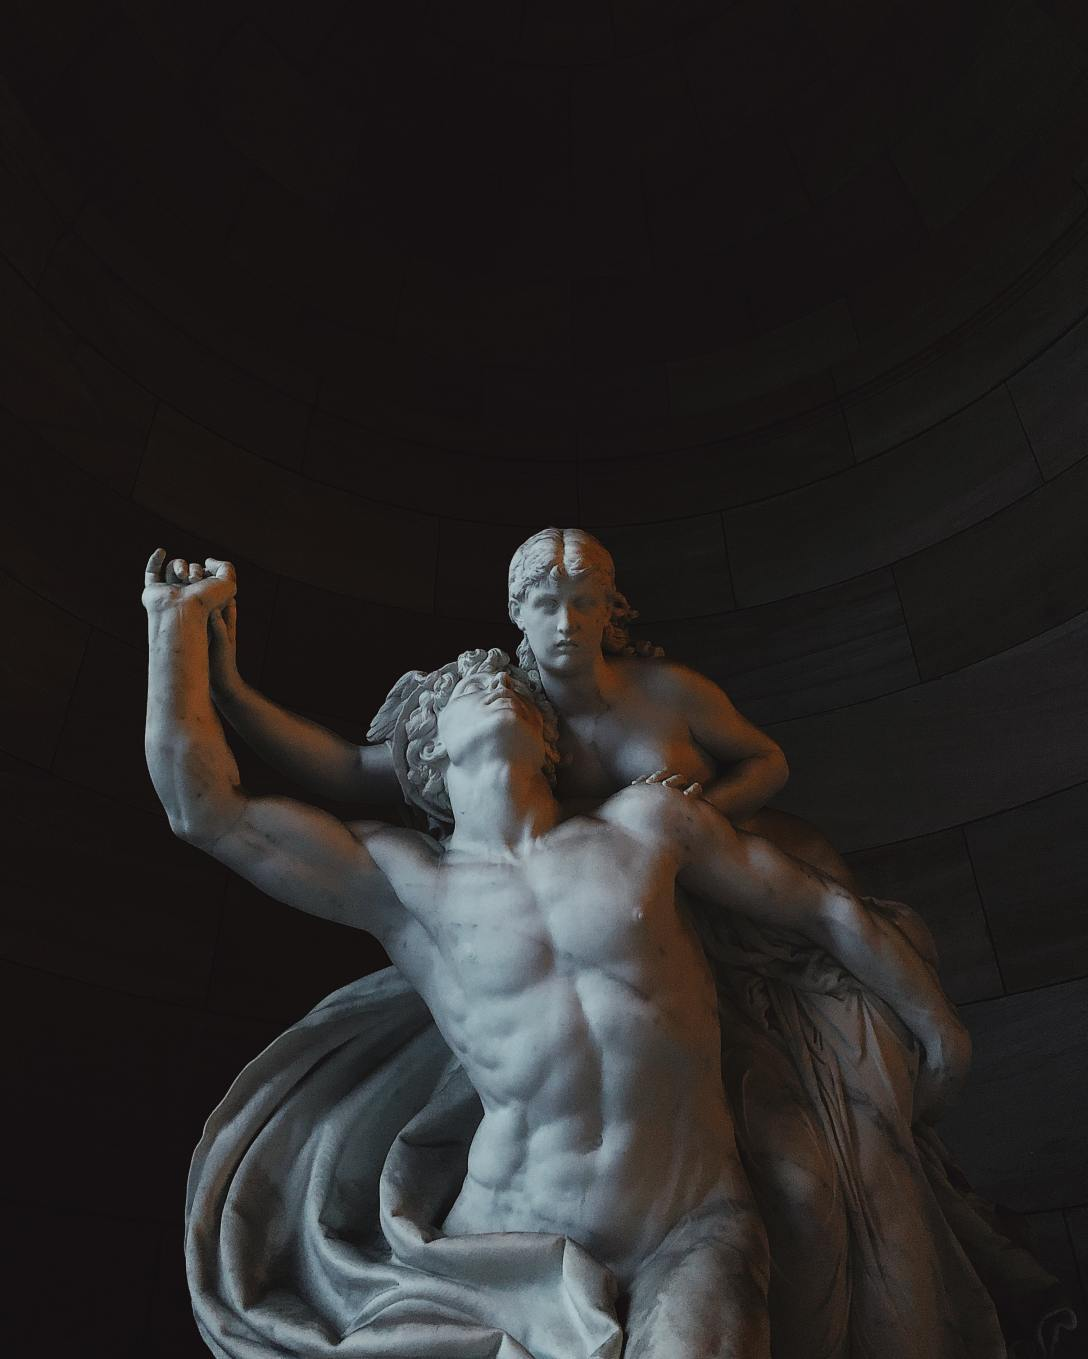 Photo of sculpture, located at Am lustgarten 1, 10178 Berlin, Germany, by Pavel Nekoranec on Unsplash